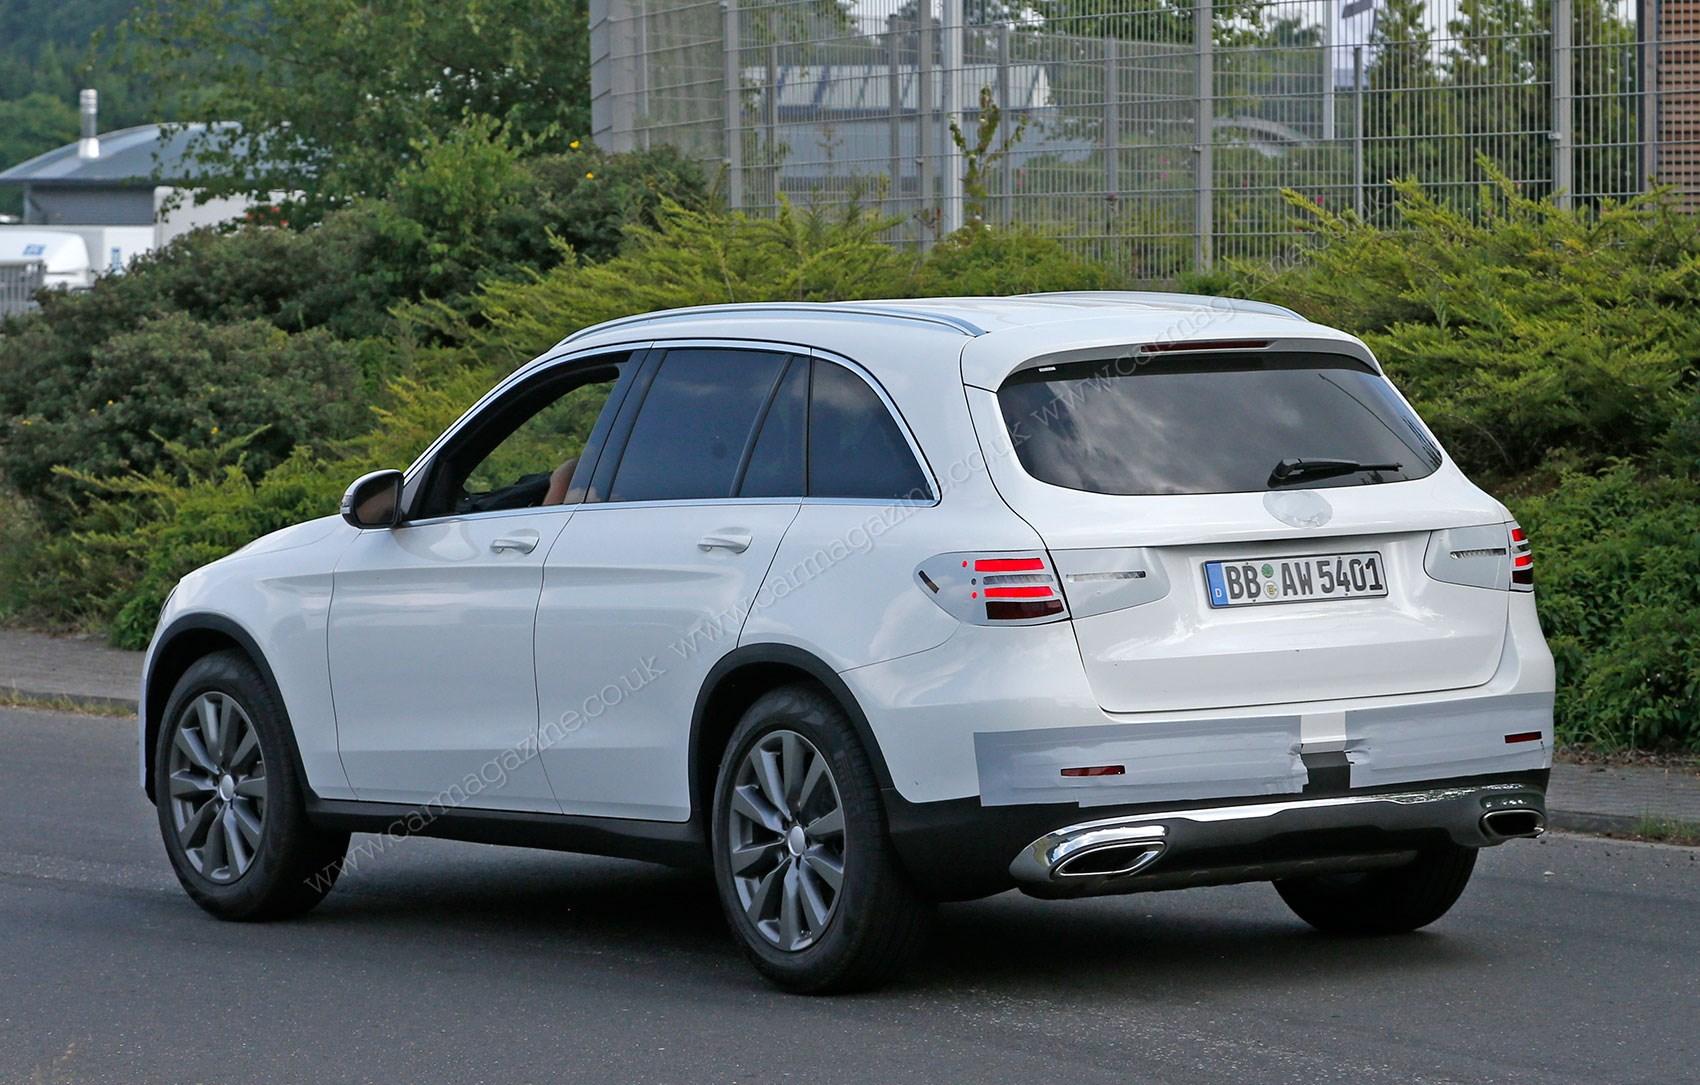 Mercedes GLC: new GLK successor spied with minimal disguise | CAR